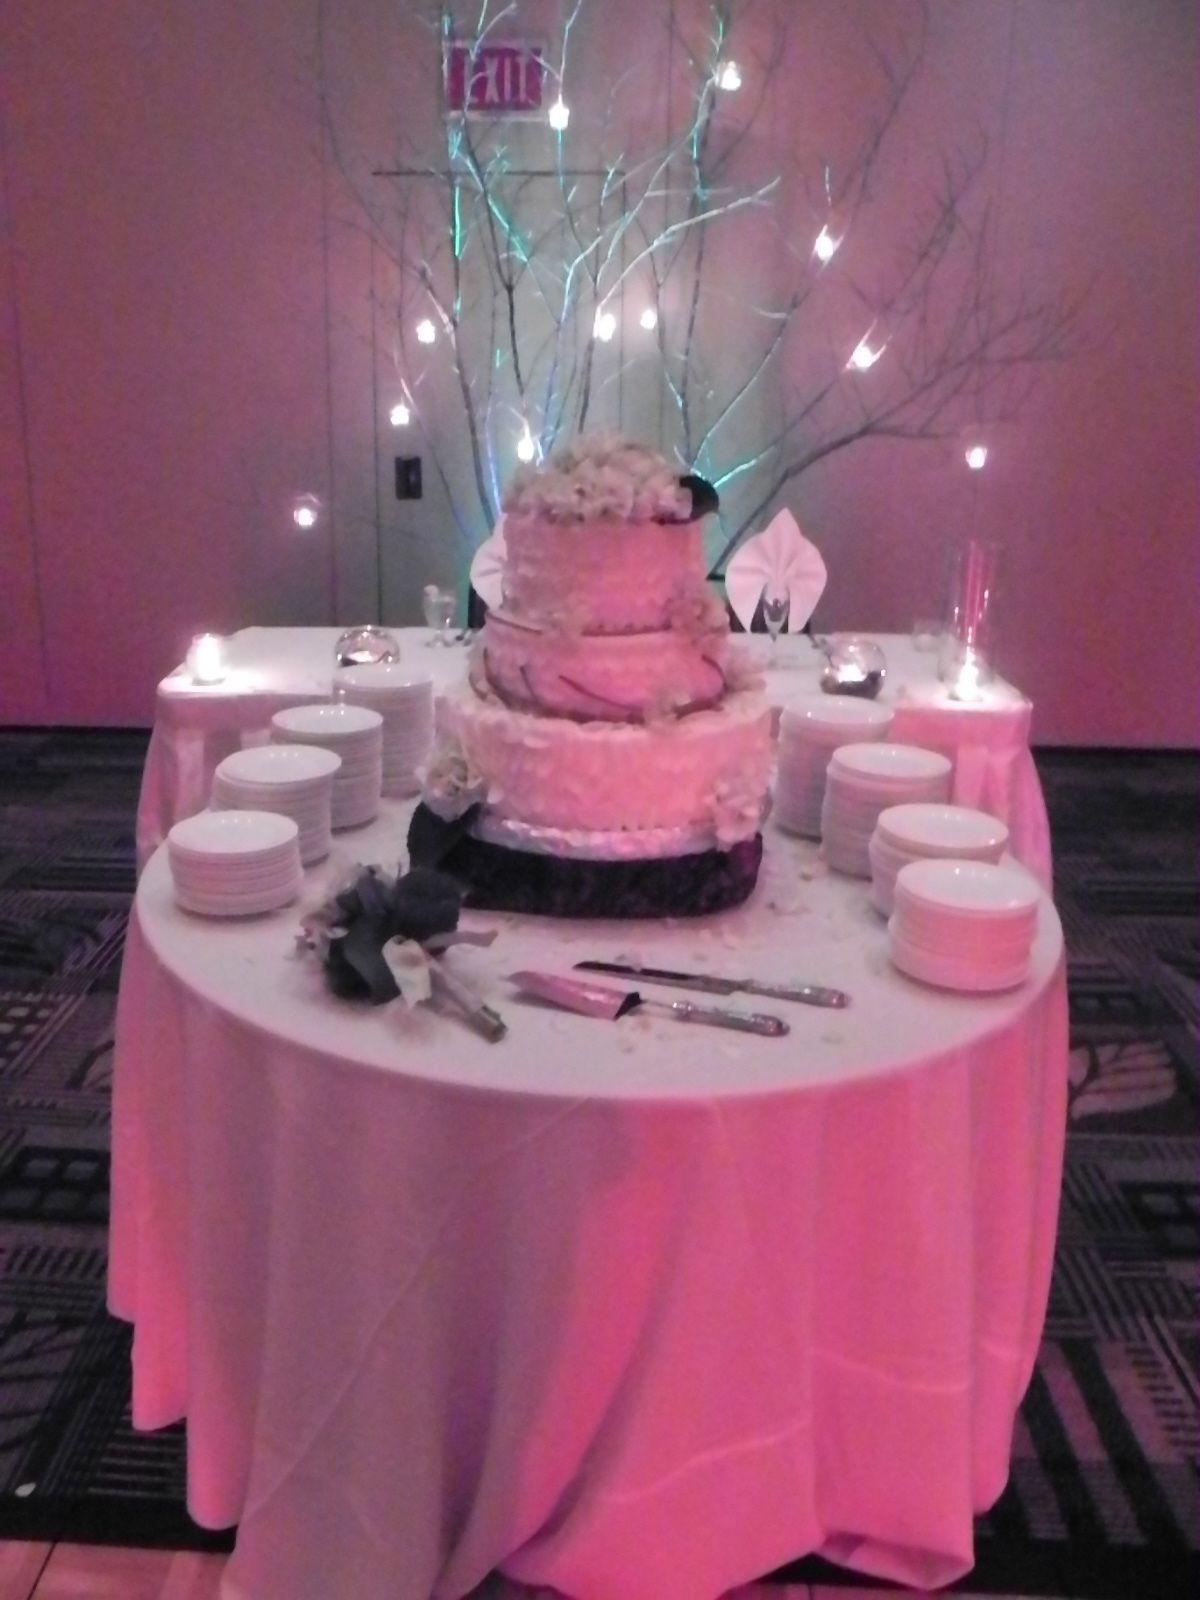 Elegant Uplighting on Wedding Cake & Table www.PDJE.net | Wedding ...